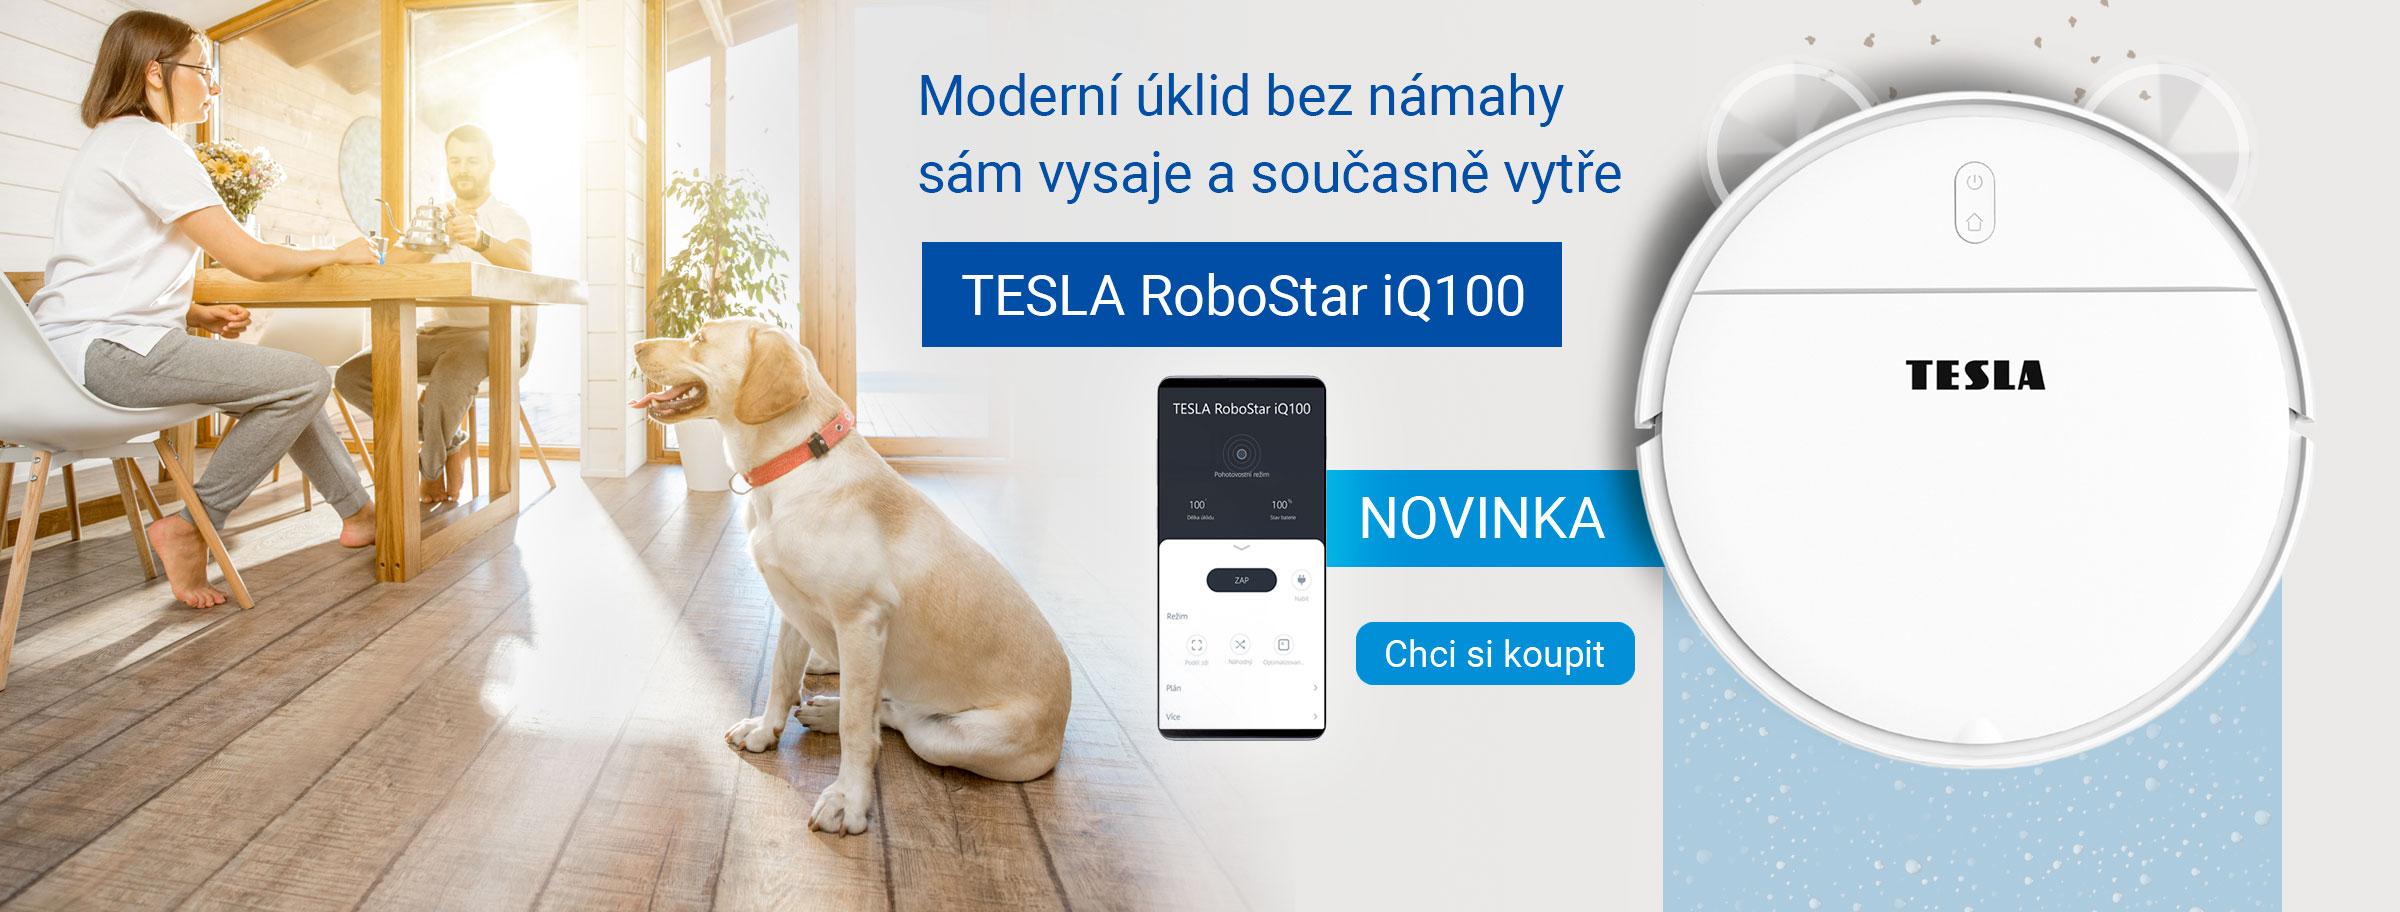 Novinka: TESLA RoboStar iQ100 - robotický vysavač